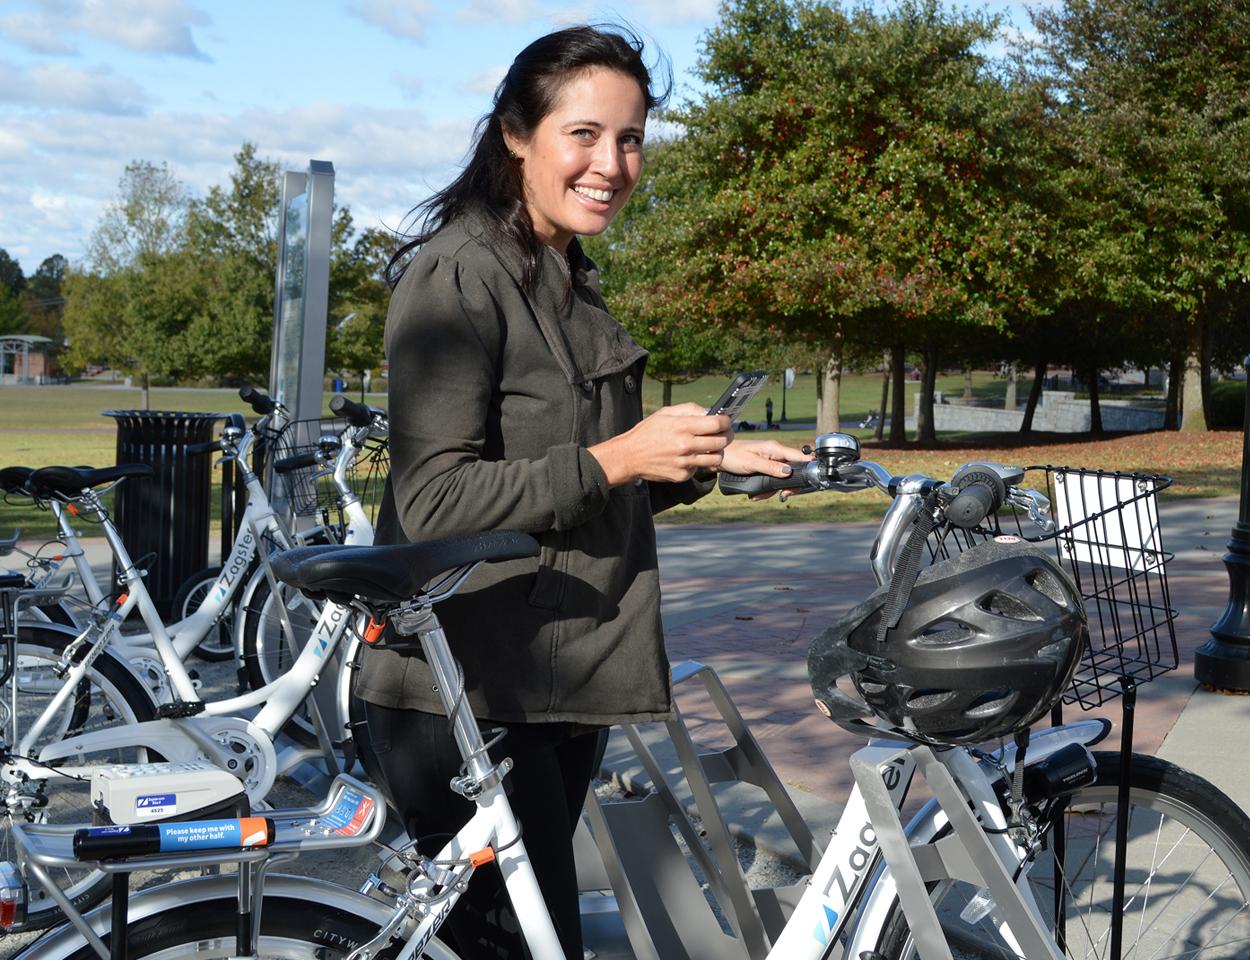 Suwanee Bike Share Program